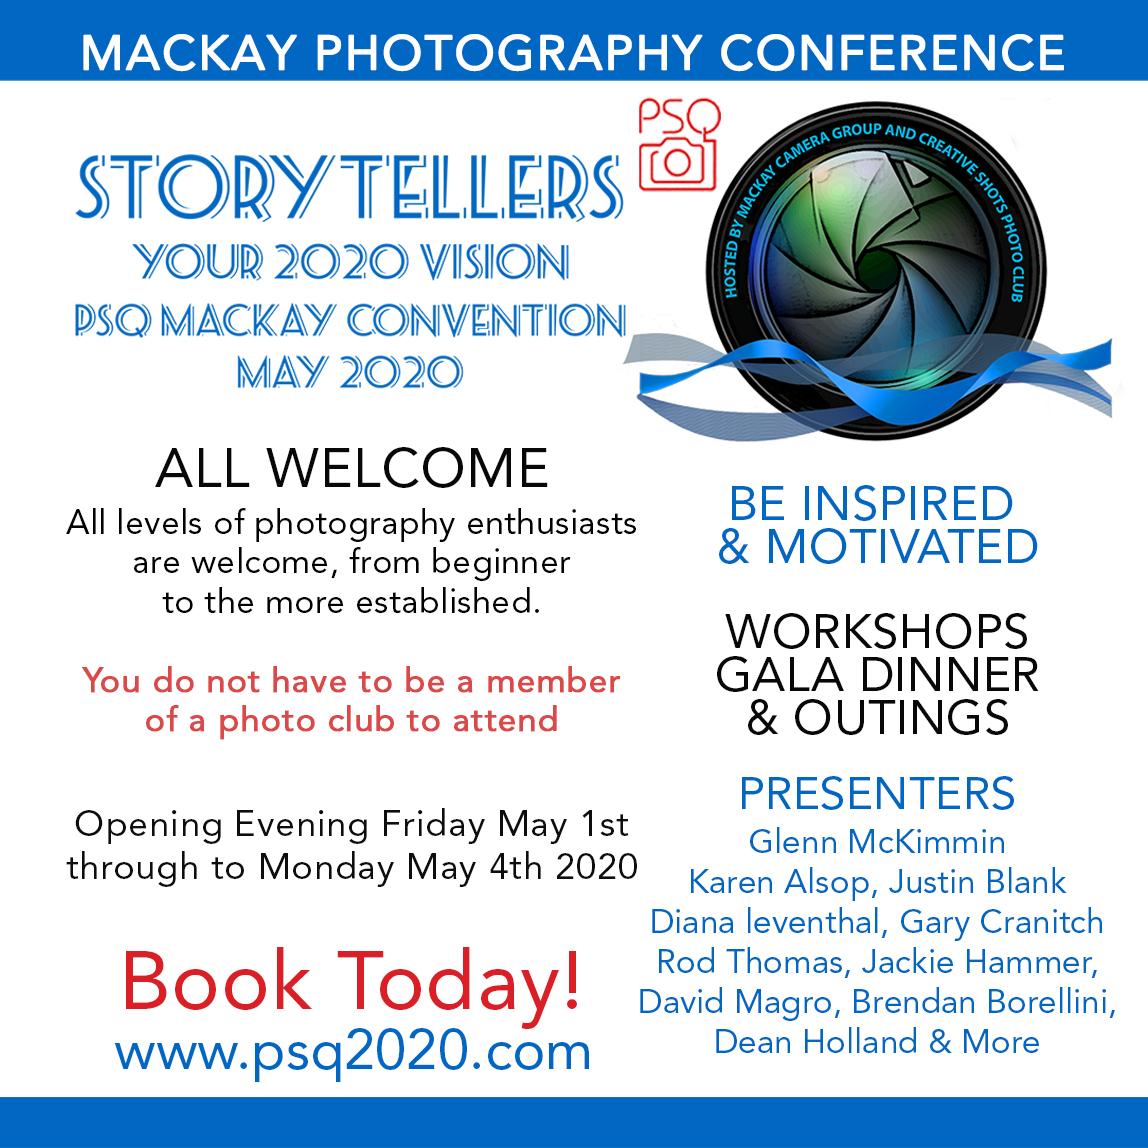 Mackay Photo Conference